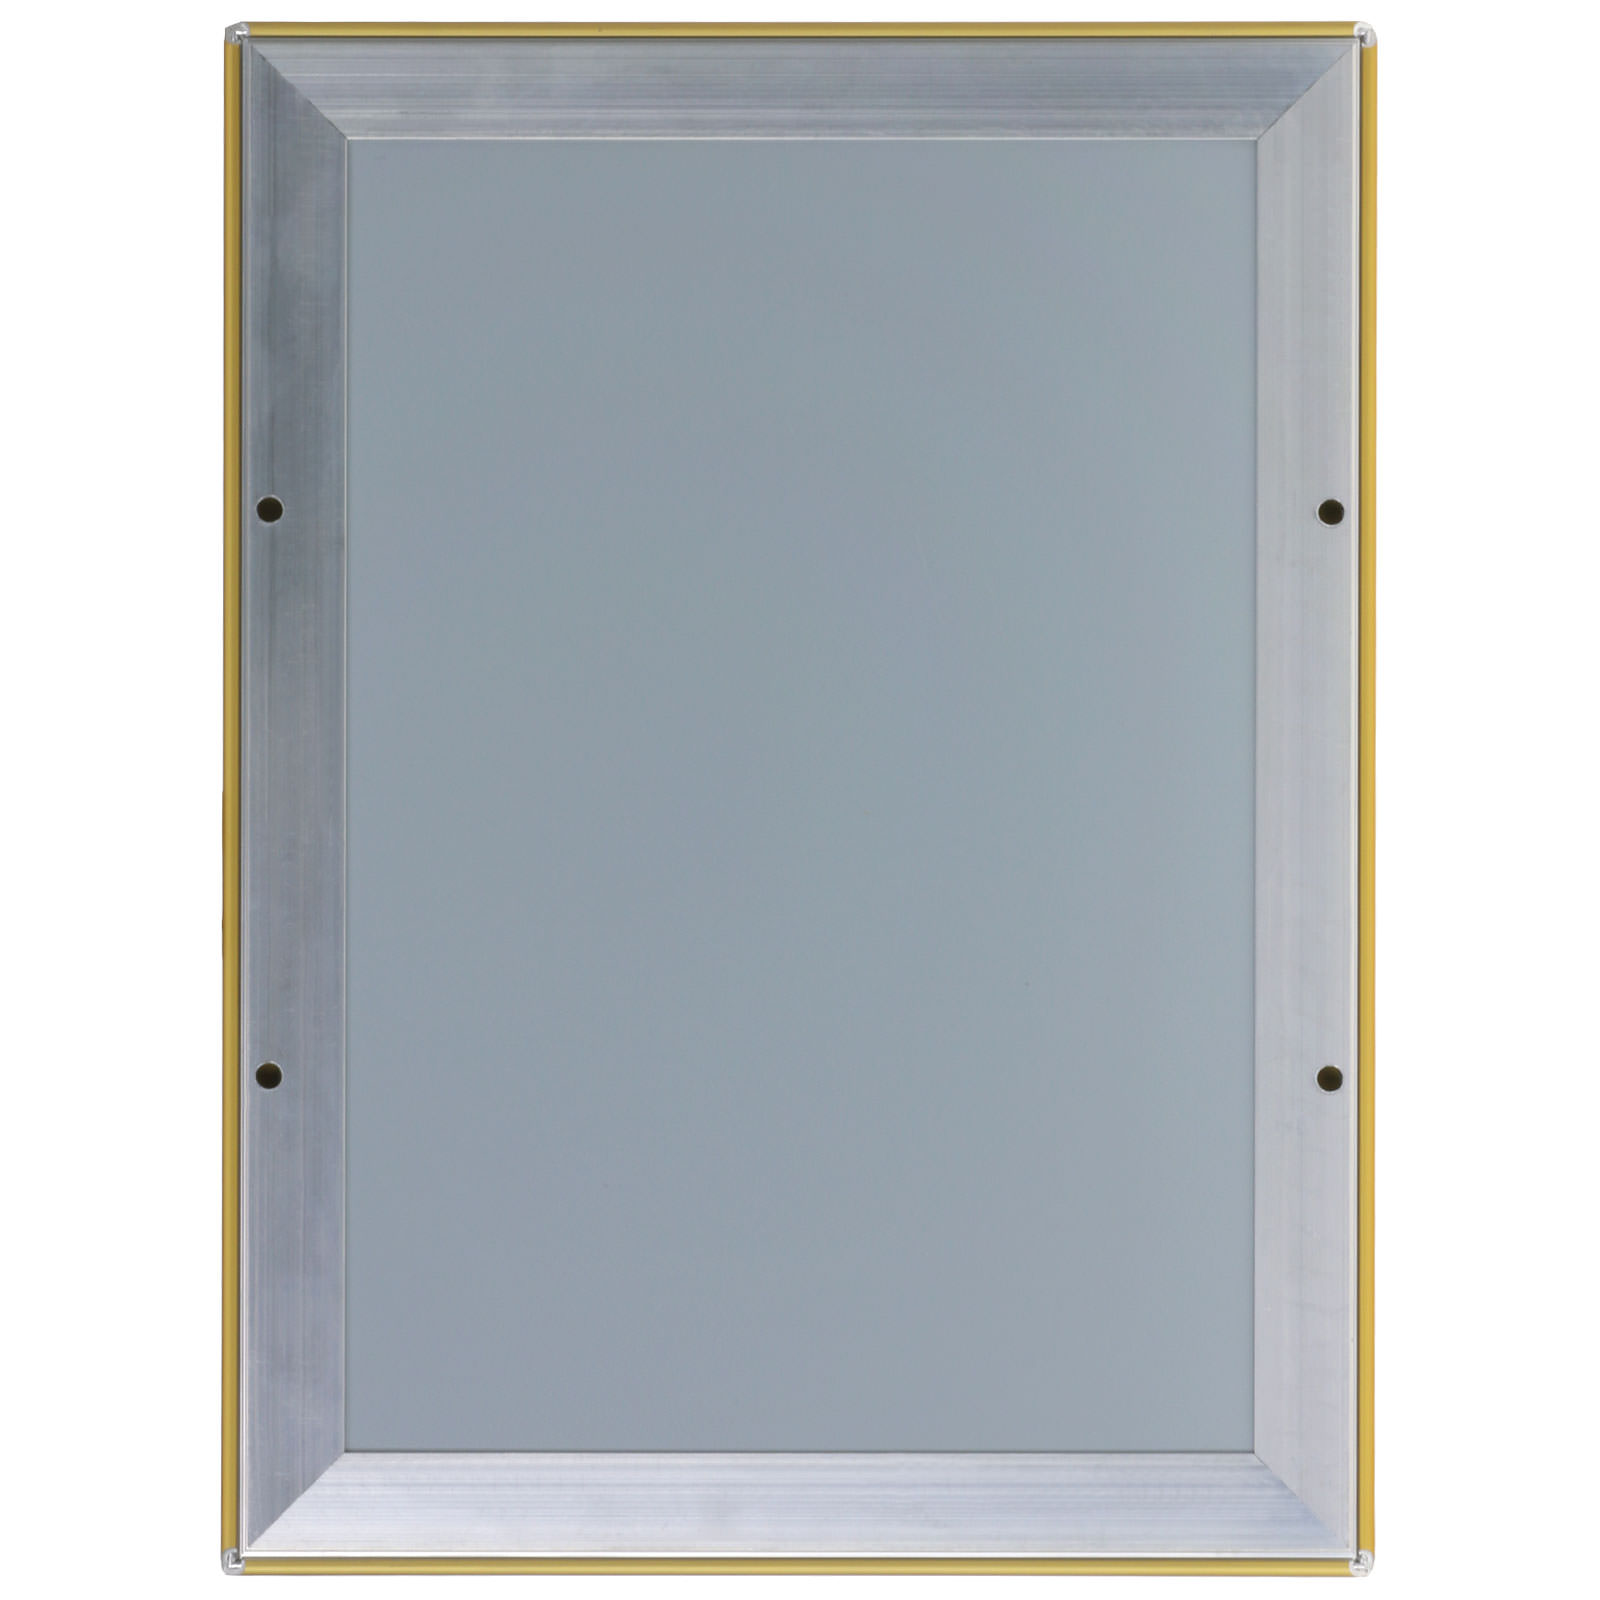 Wunderbar Snap Plakatrahmen Galerie - Benutzerdefinierte ...